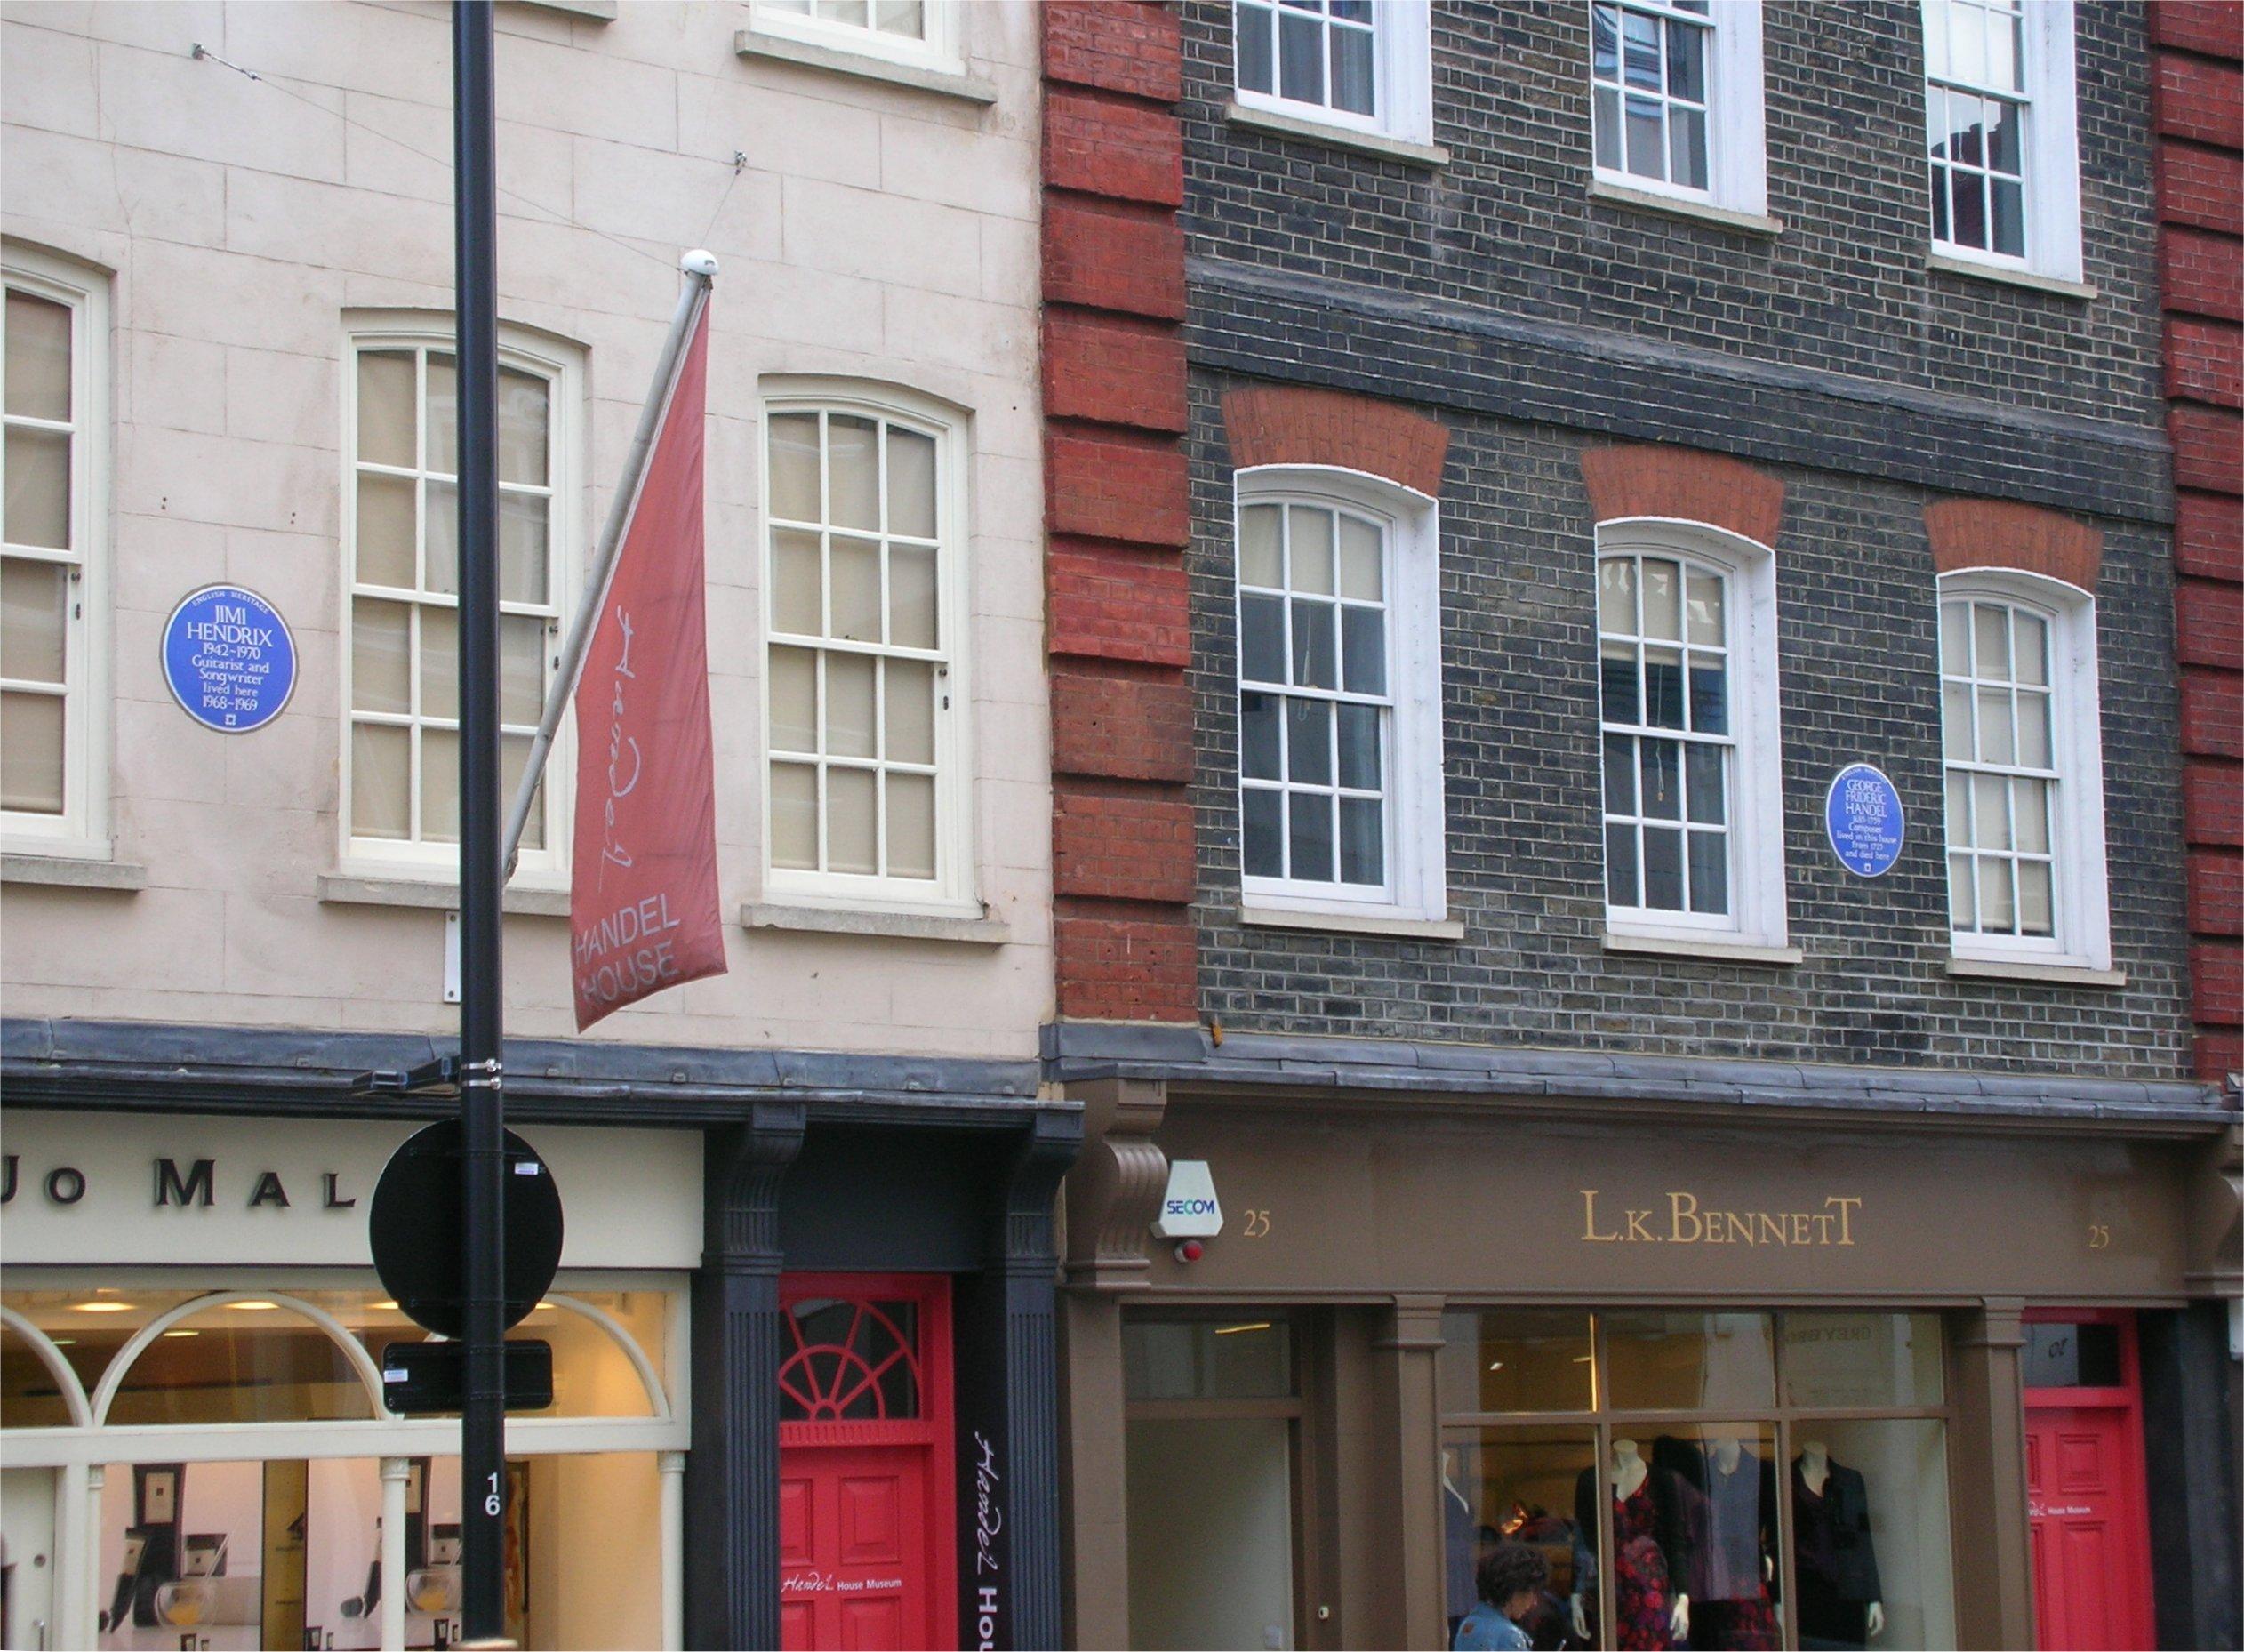 Hendrix_and_Handel_houses,_Brook_Street